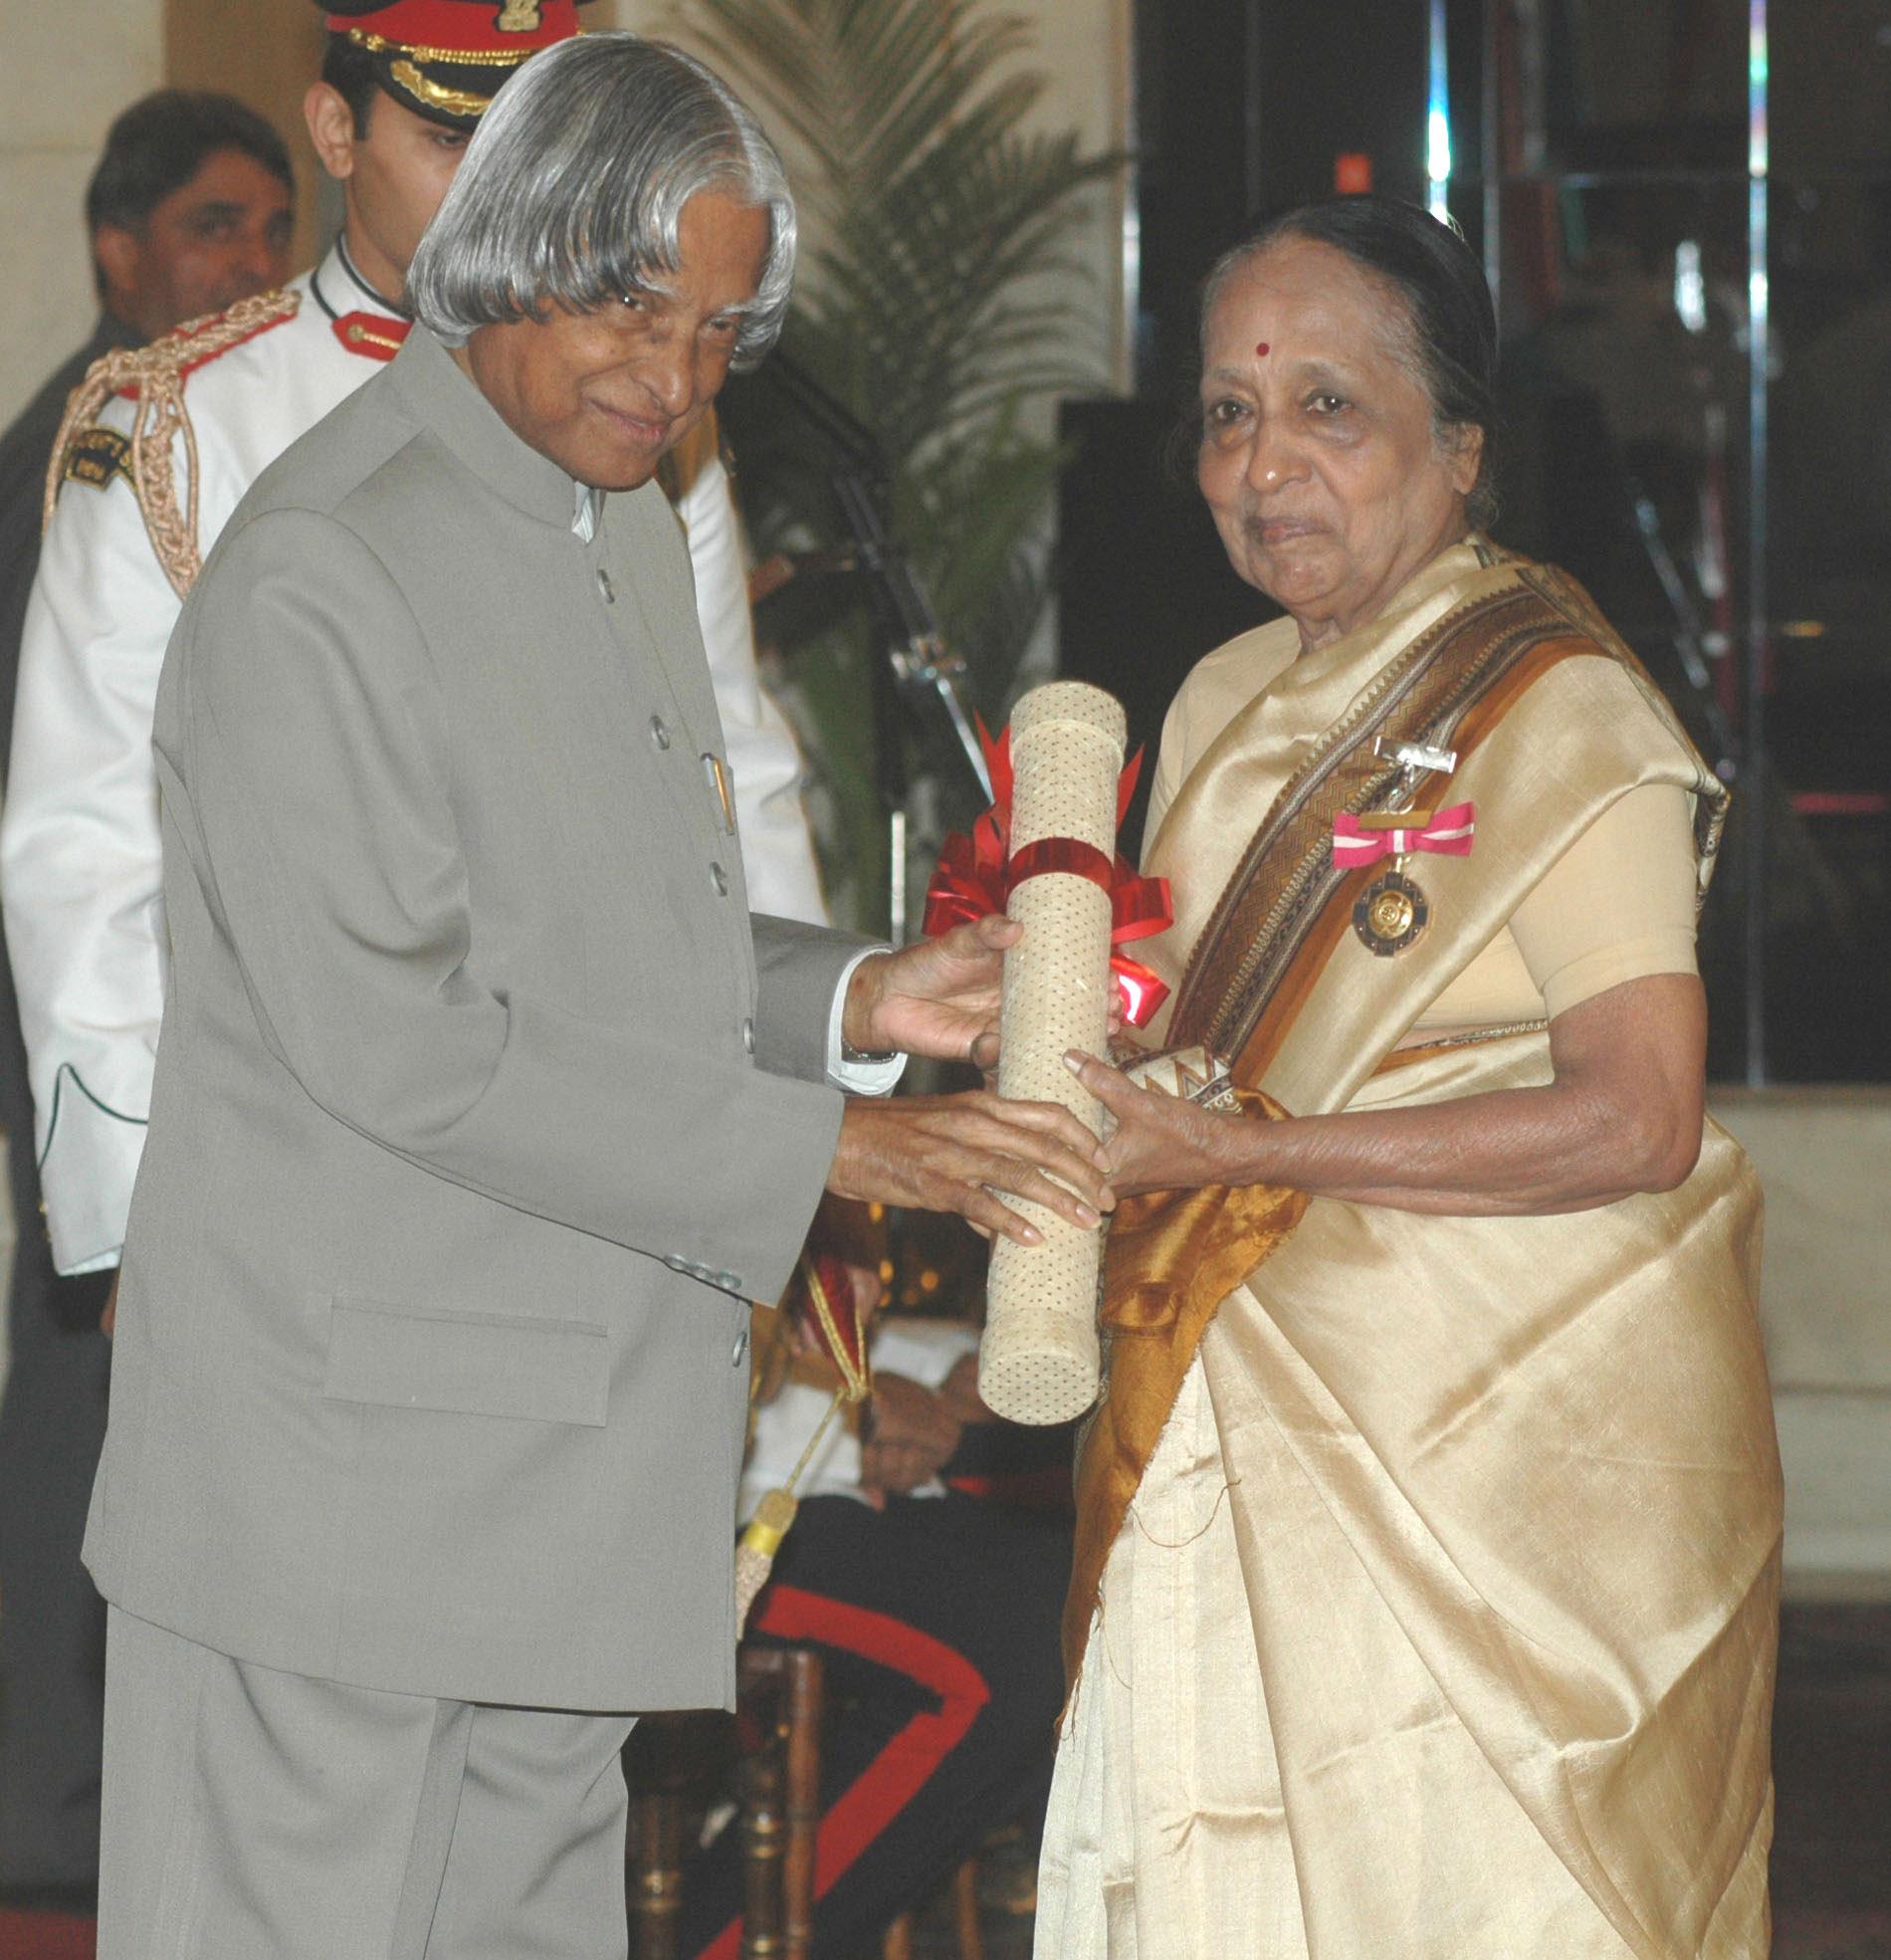 Dr. A.P.J. Abdul Kalam, President of India, presenting the Padma Bhushan to Shanta